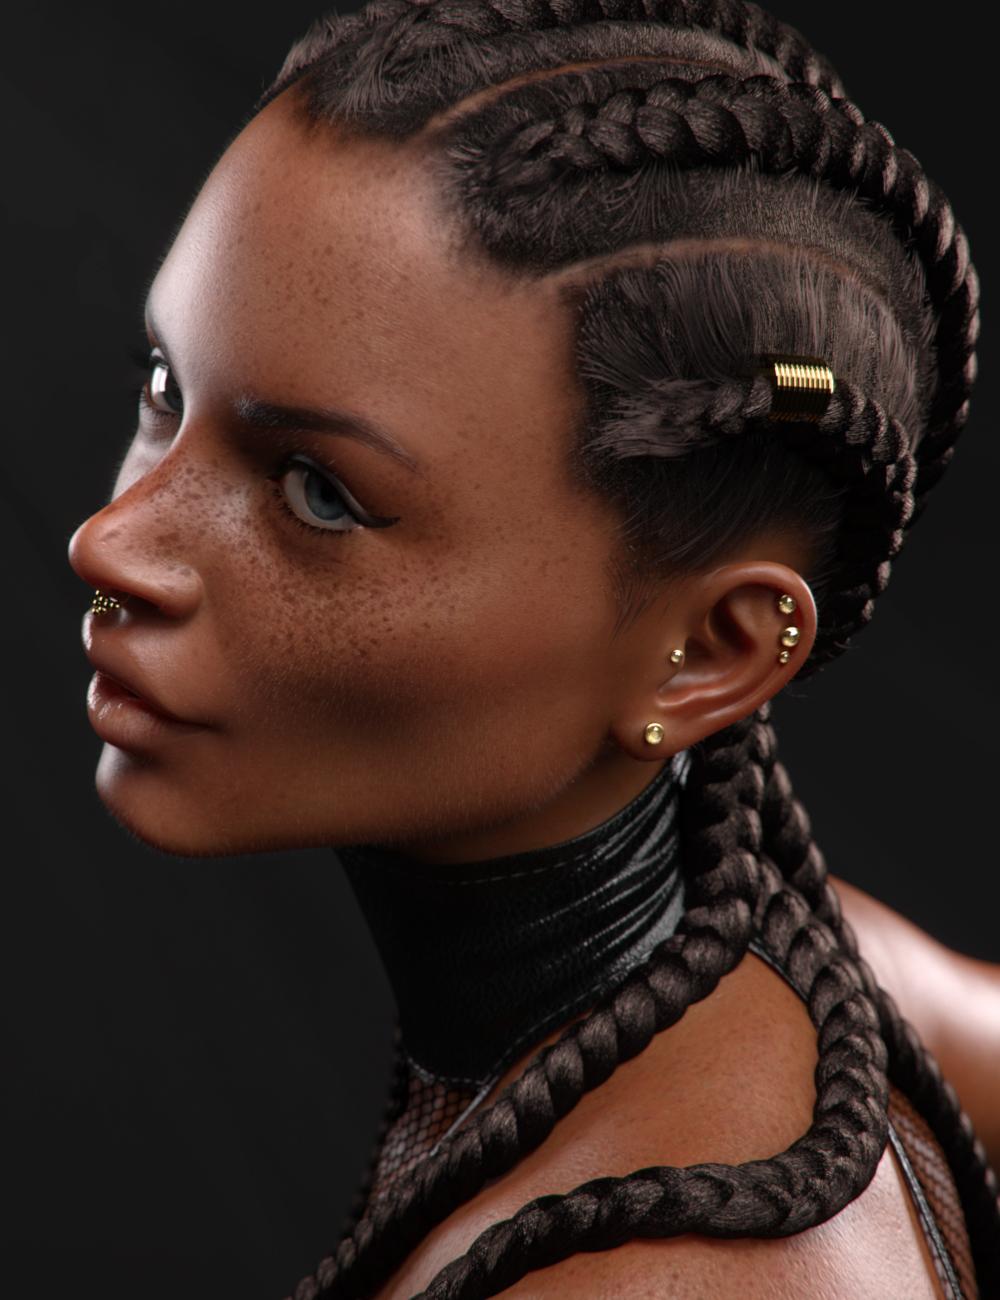 Minka for Latonya 8 by: VincentXyooj, 3D Models by Daz 3D